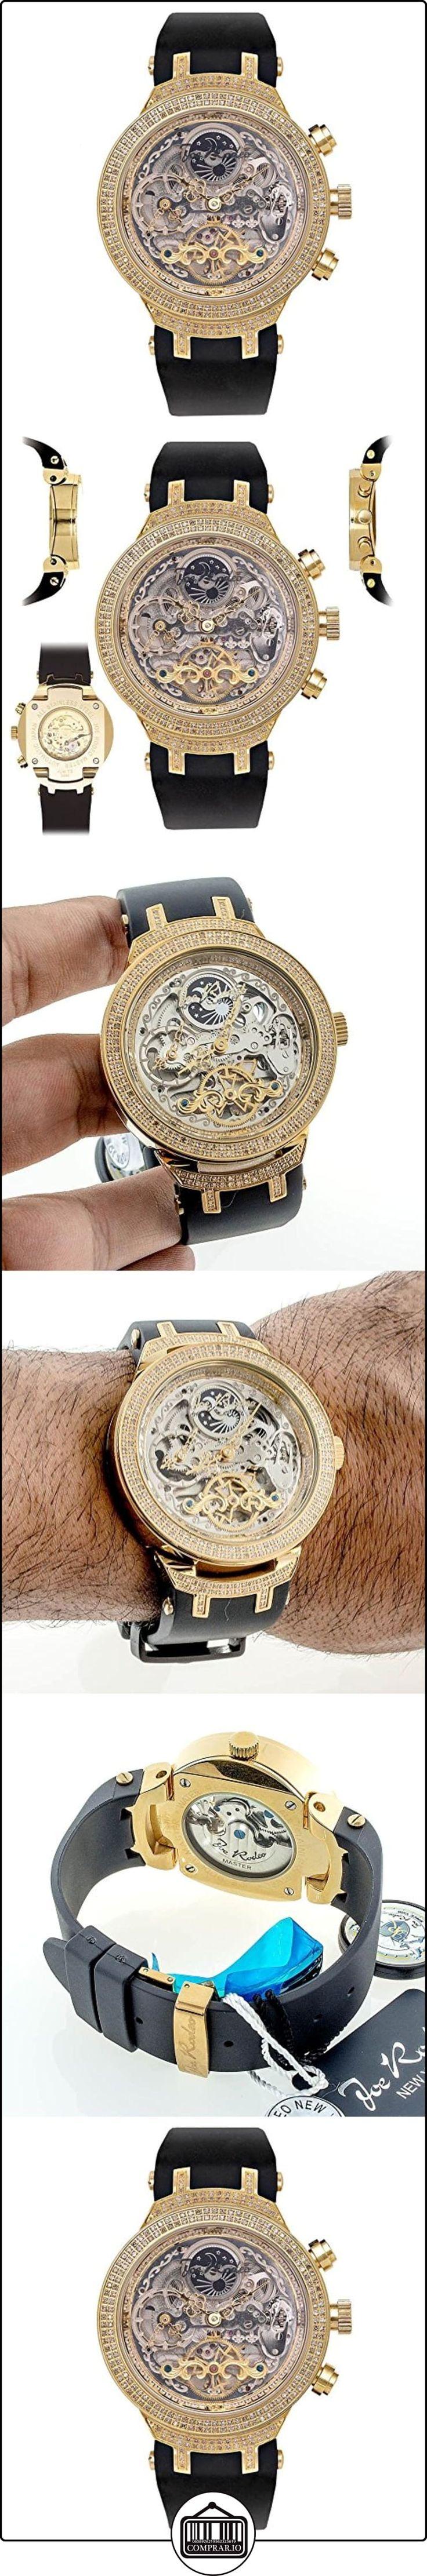 JOE RODEO Diamond Reloj para hombre-Master Oro 2.2quilates de  ✿ Relojes para hombre - (Lujo) ✿